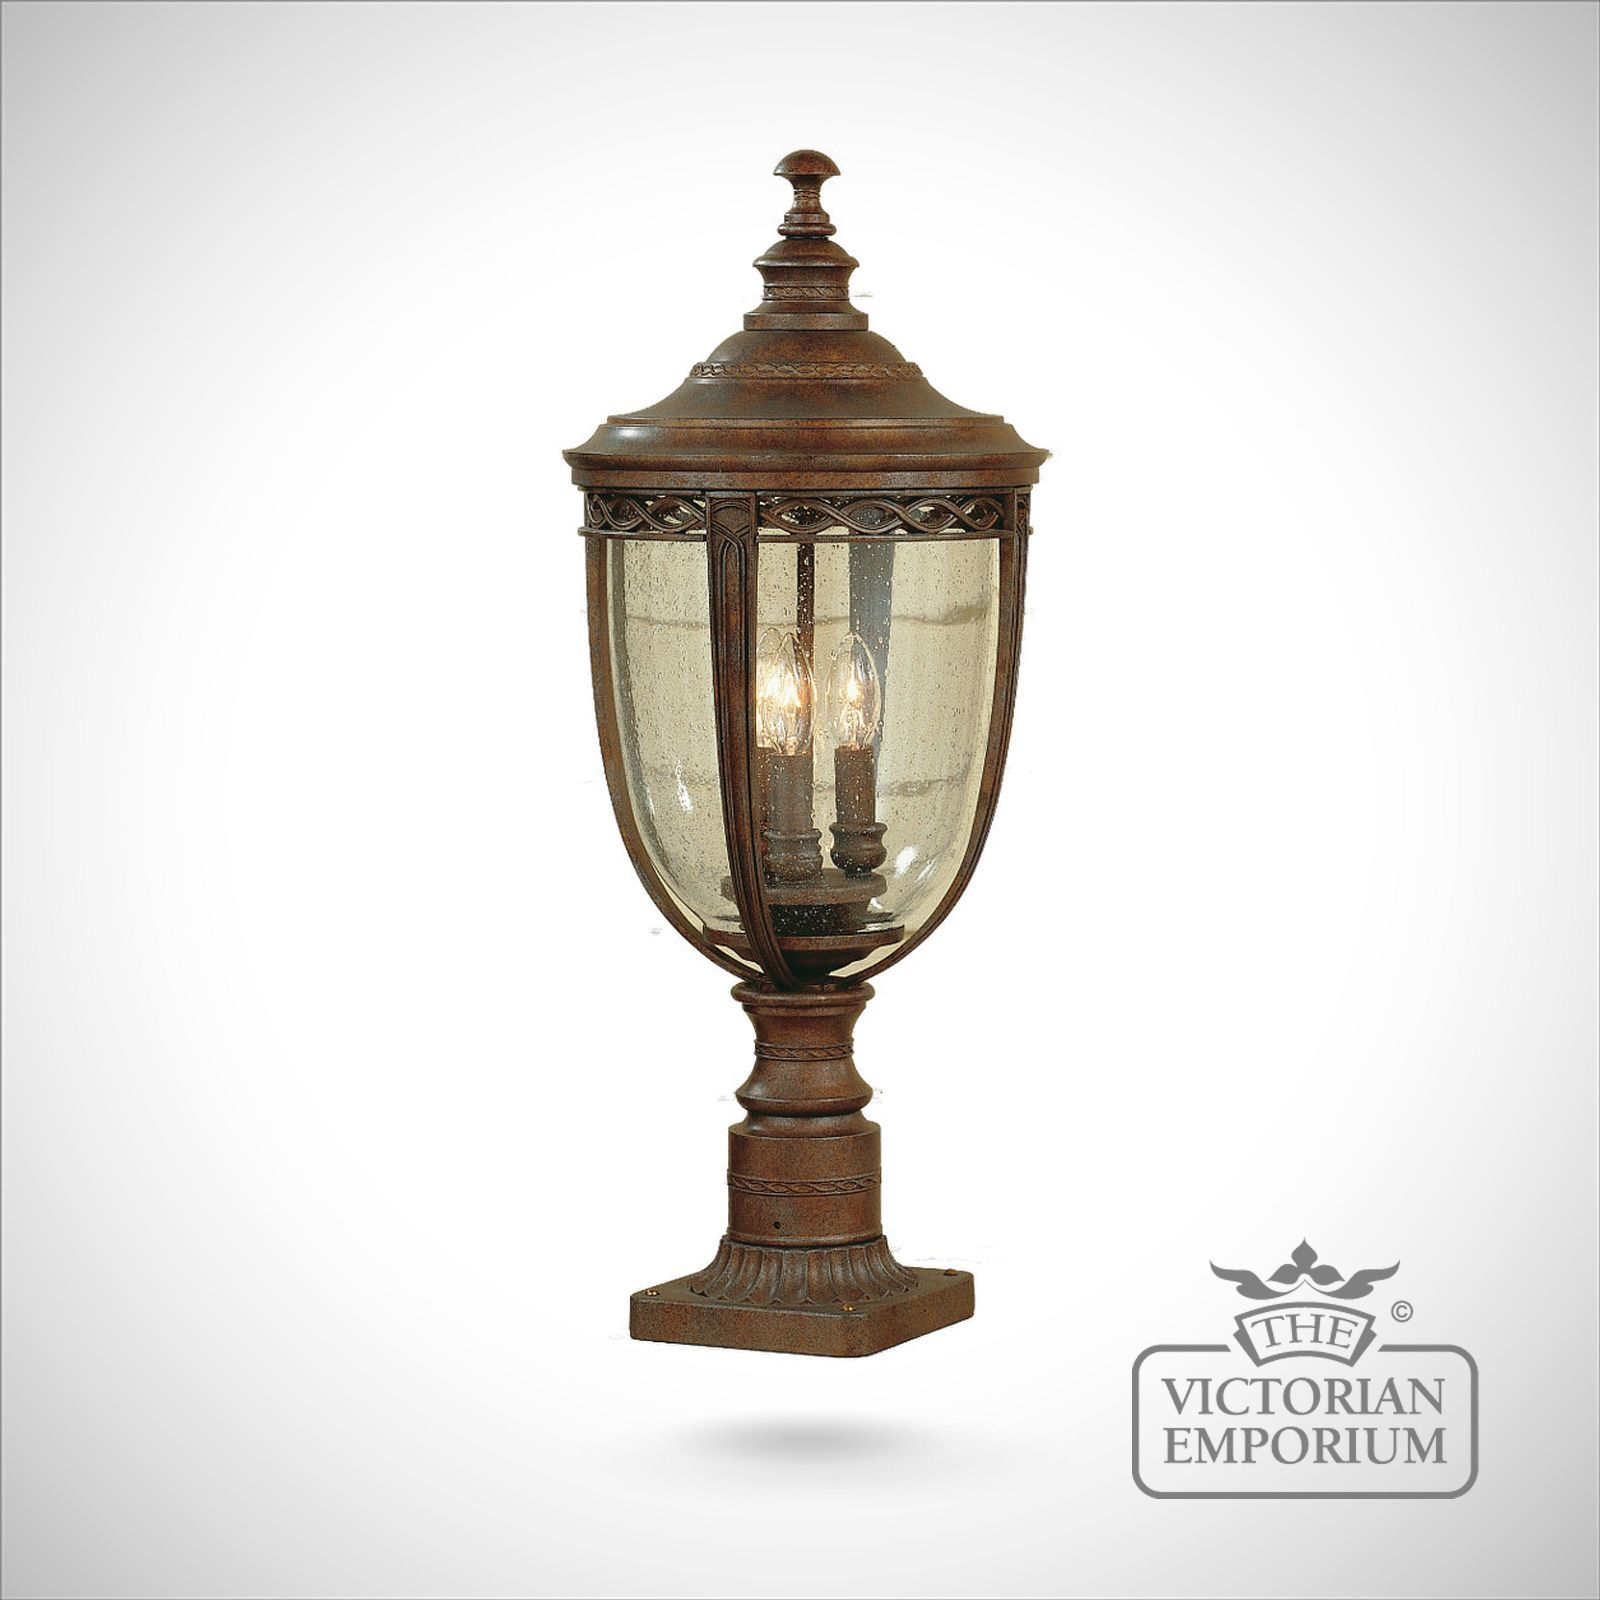 Bedfords Medium Pedestal Lantern In Black: Bridle Large Pedestal Lamp In British Bronze